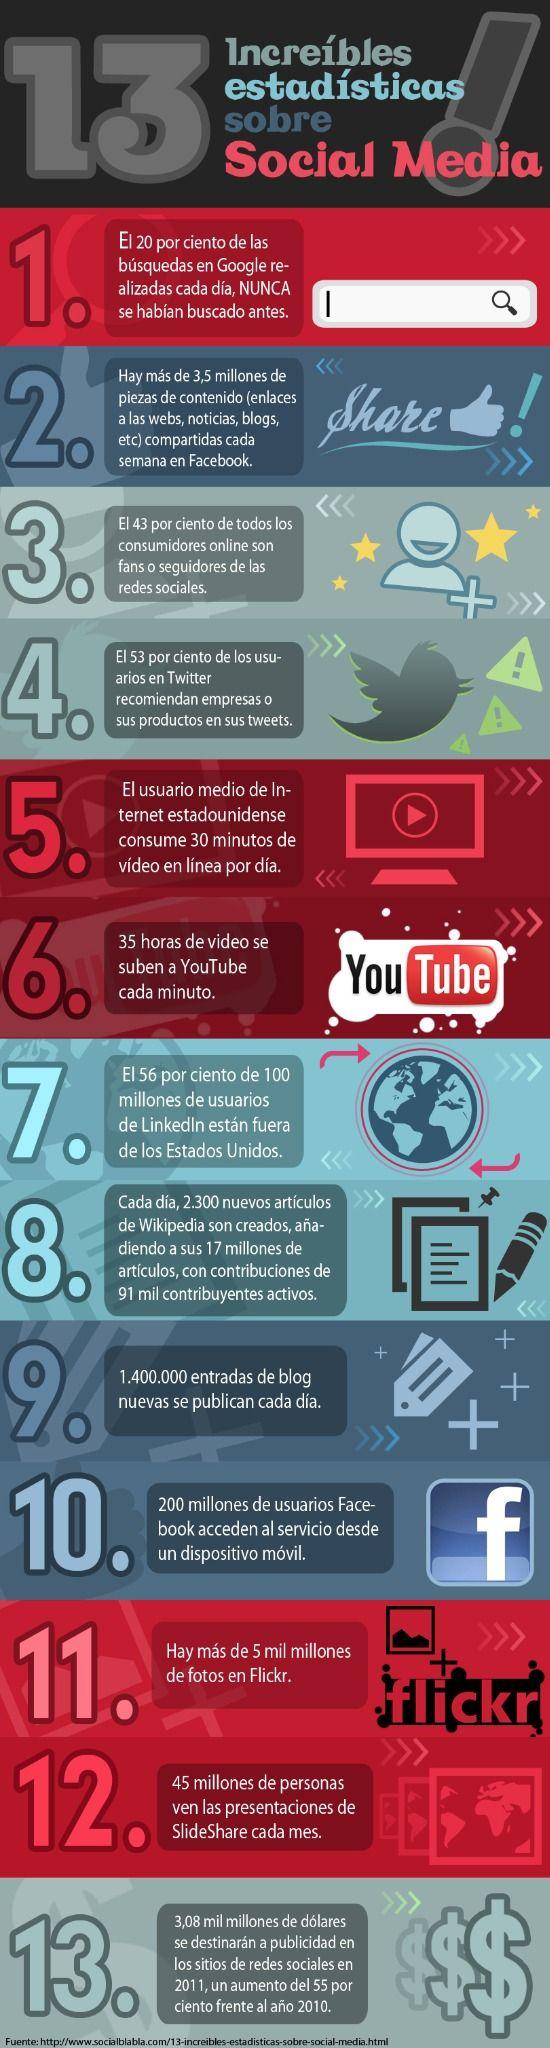 13 estadísticas increíbles sobre el Social Media #infografia #infographic #socialmedia